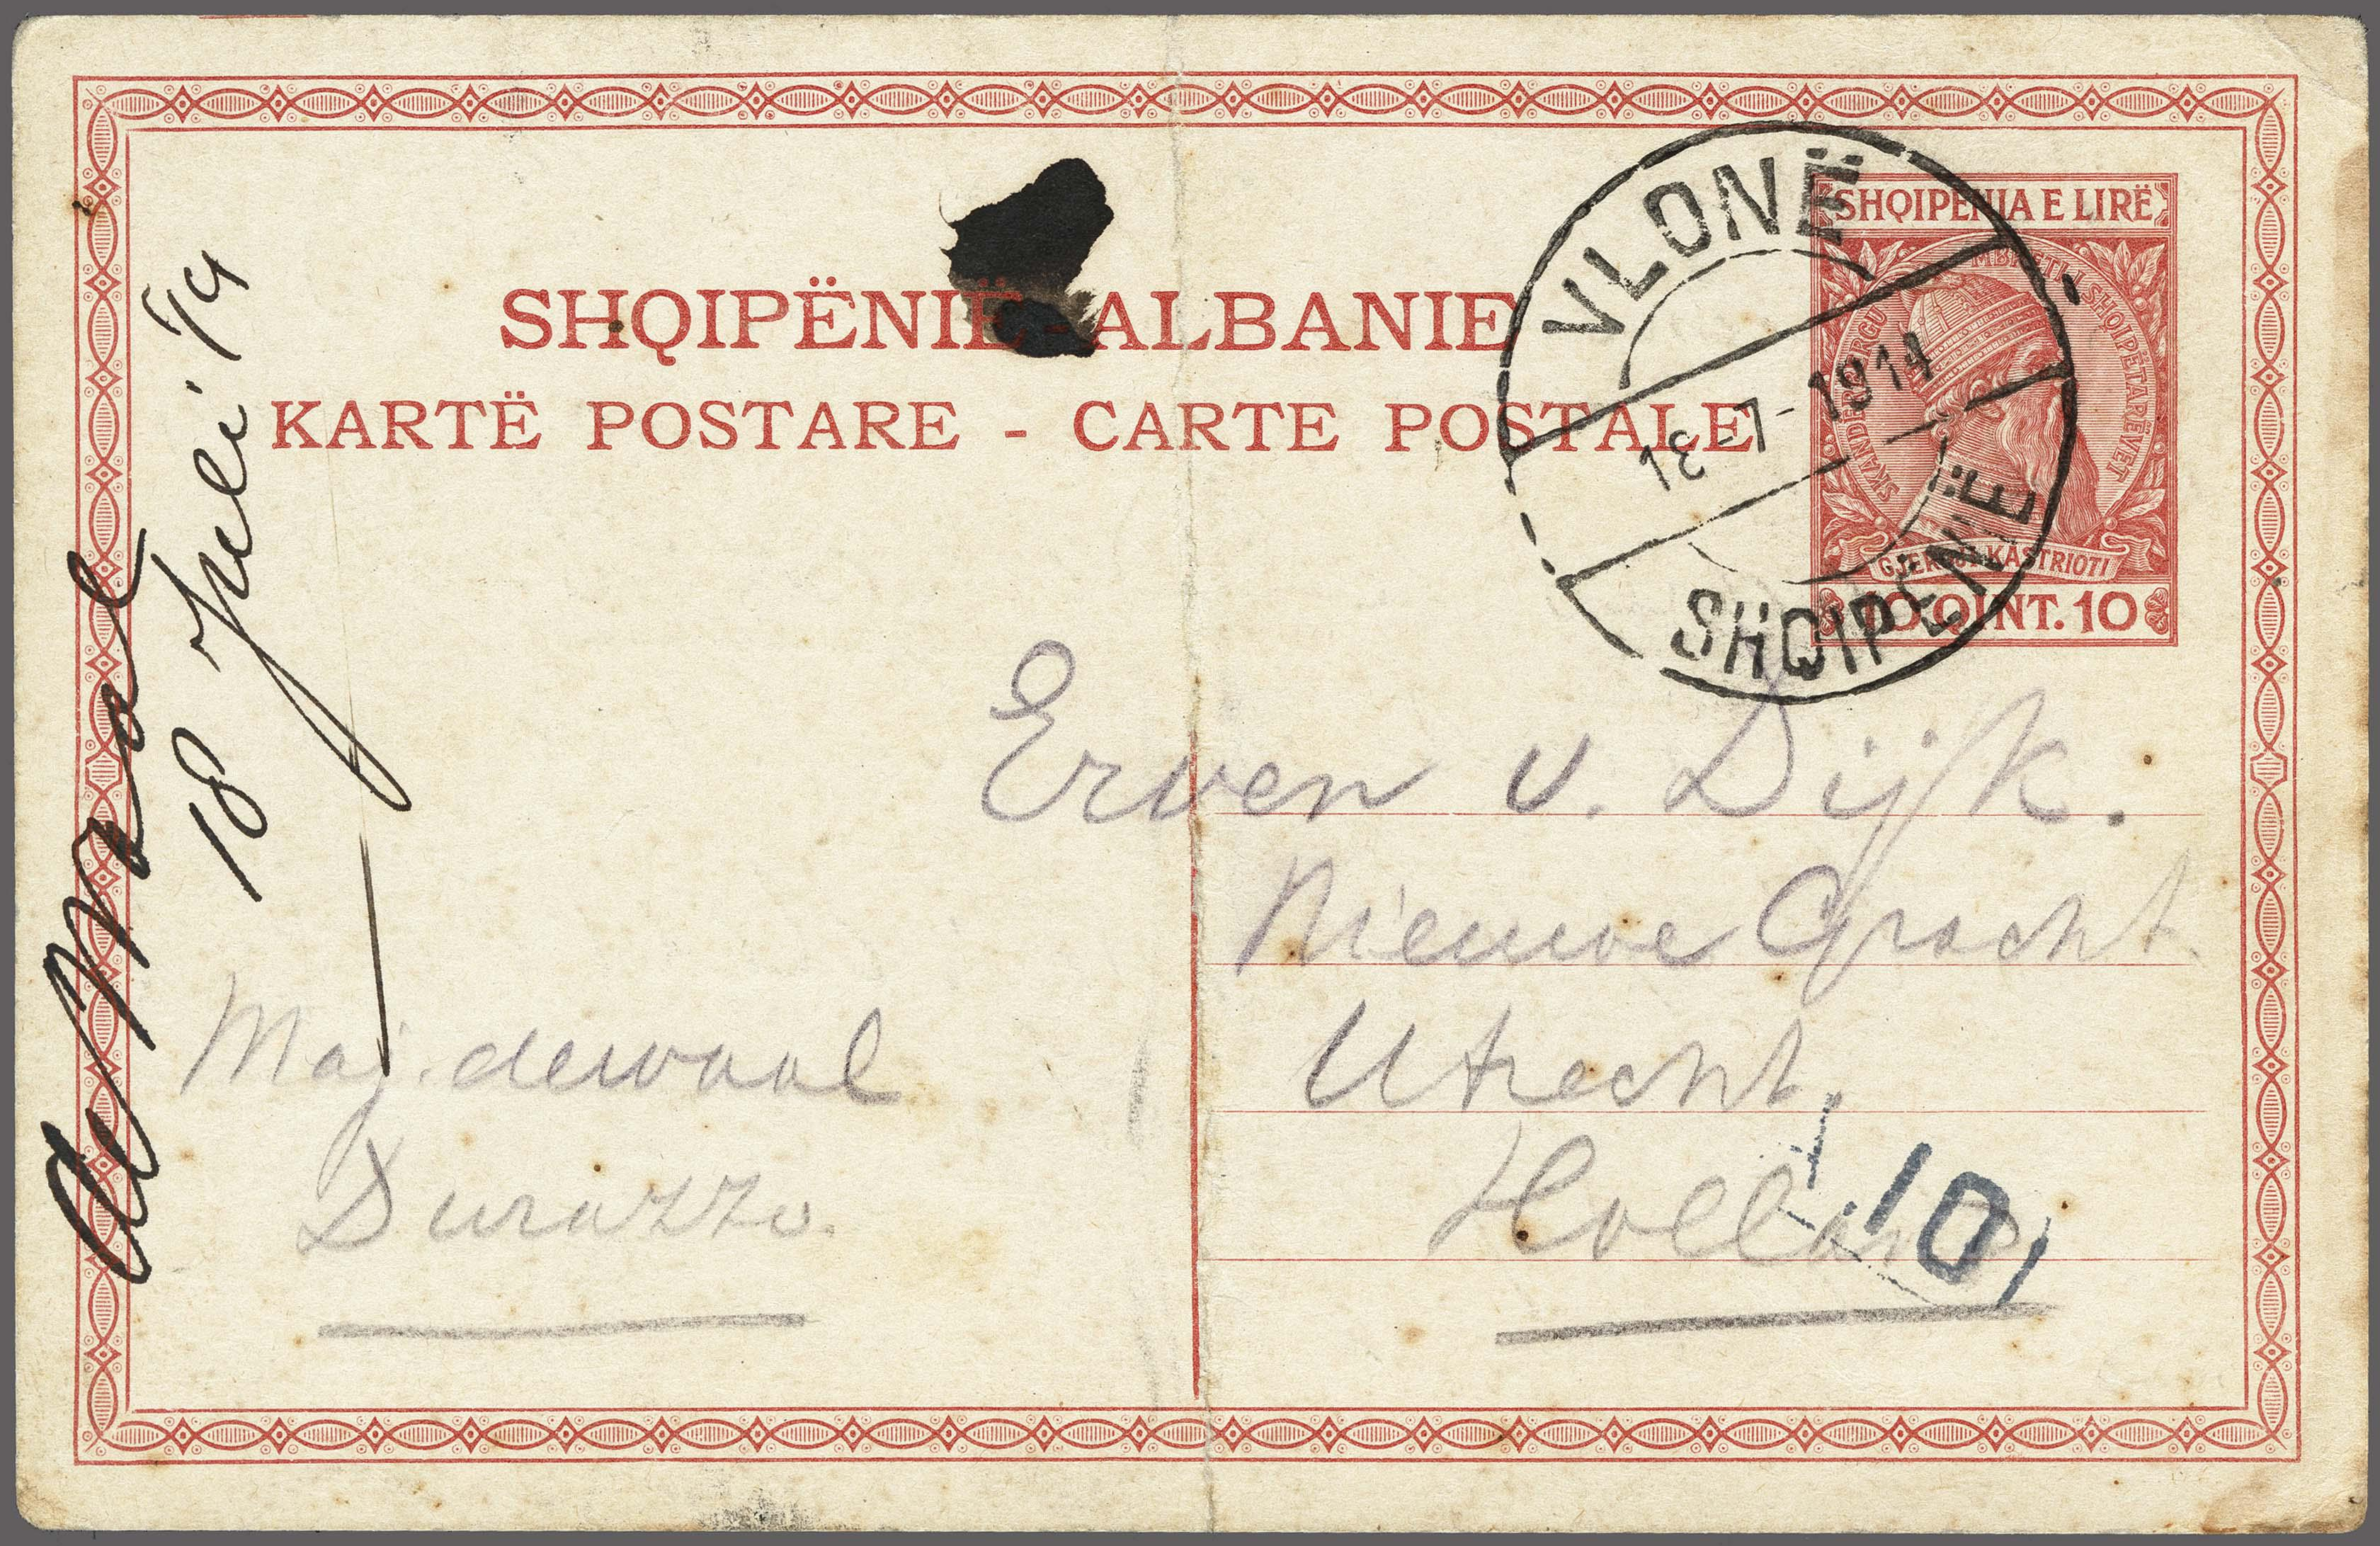 Lot 3 - European Countries Albania -  Corinphila Veilingen Auction 250-253 - Day 1 - Foreign countries